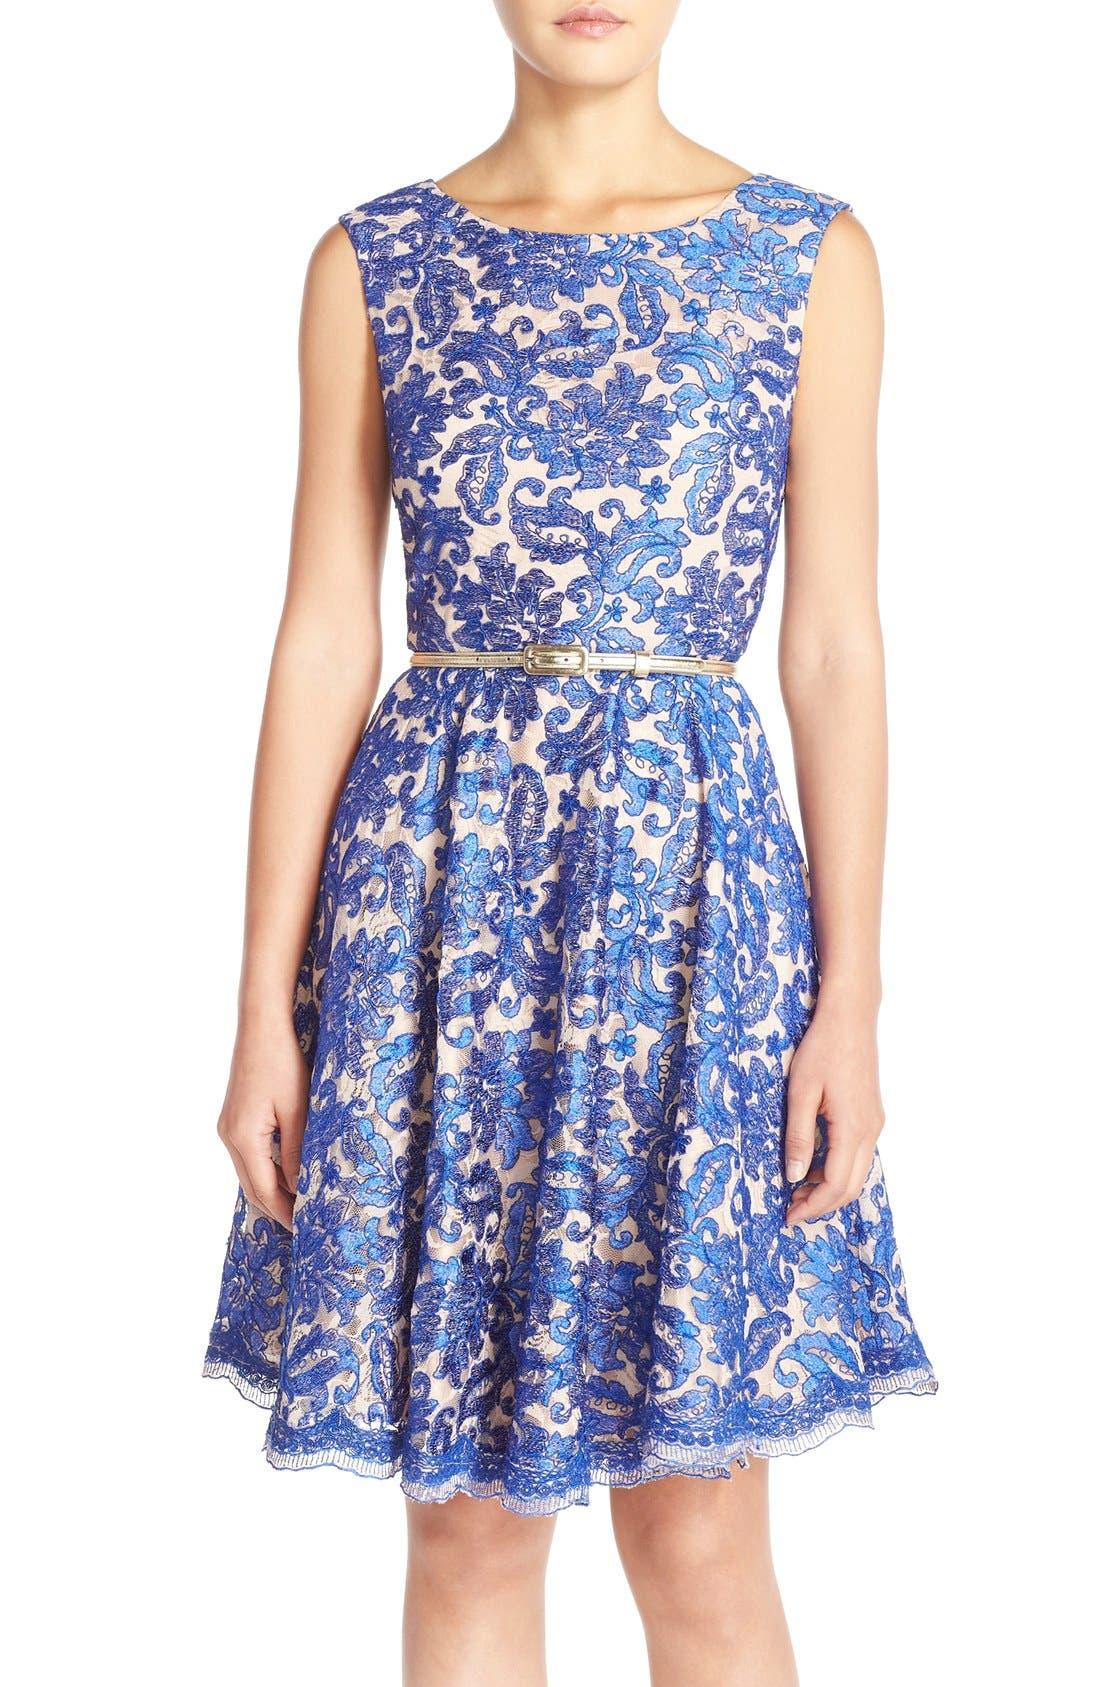 Alternate Image 1 Selected - Eliza J Embroidered Lace Fit & Flare Dress (Regular & Petite)